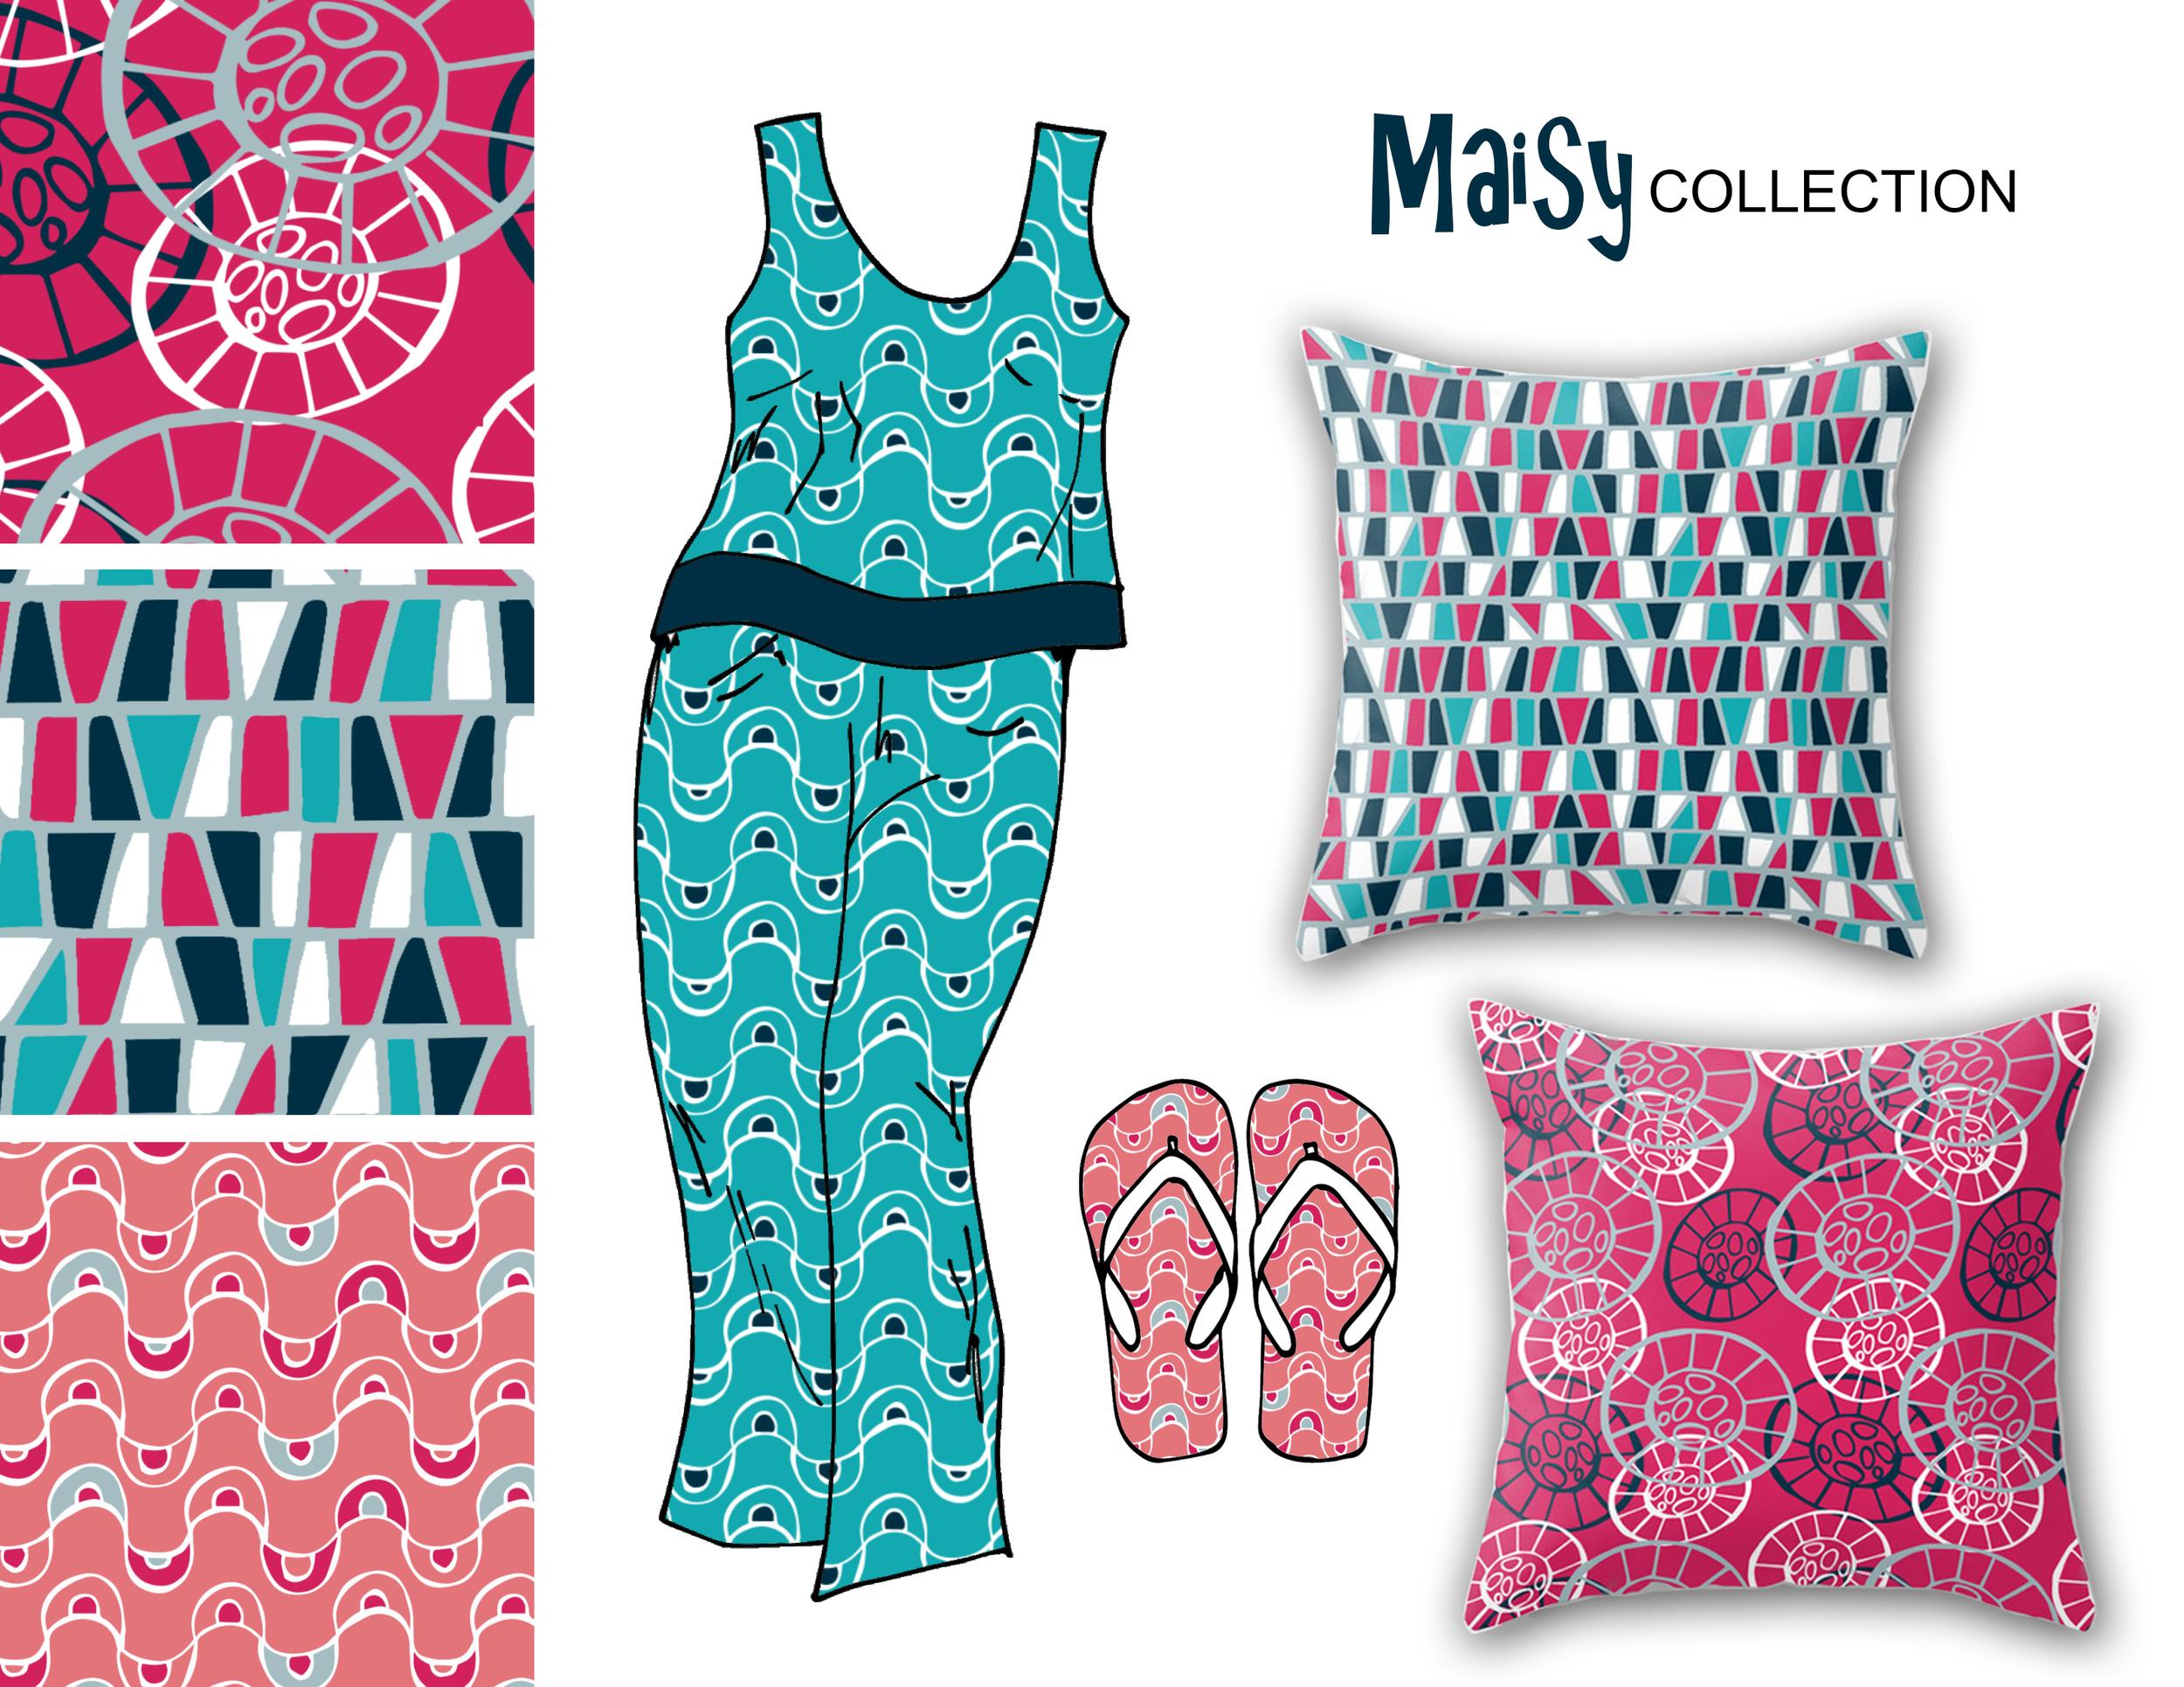 Maisy patterned mockups4.jpg